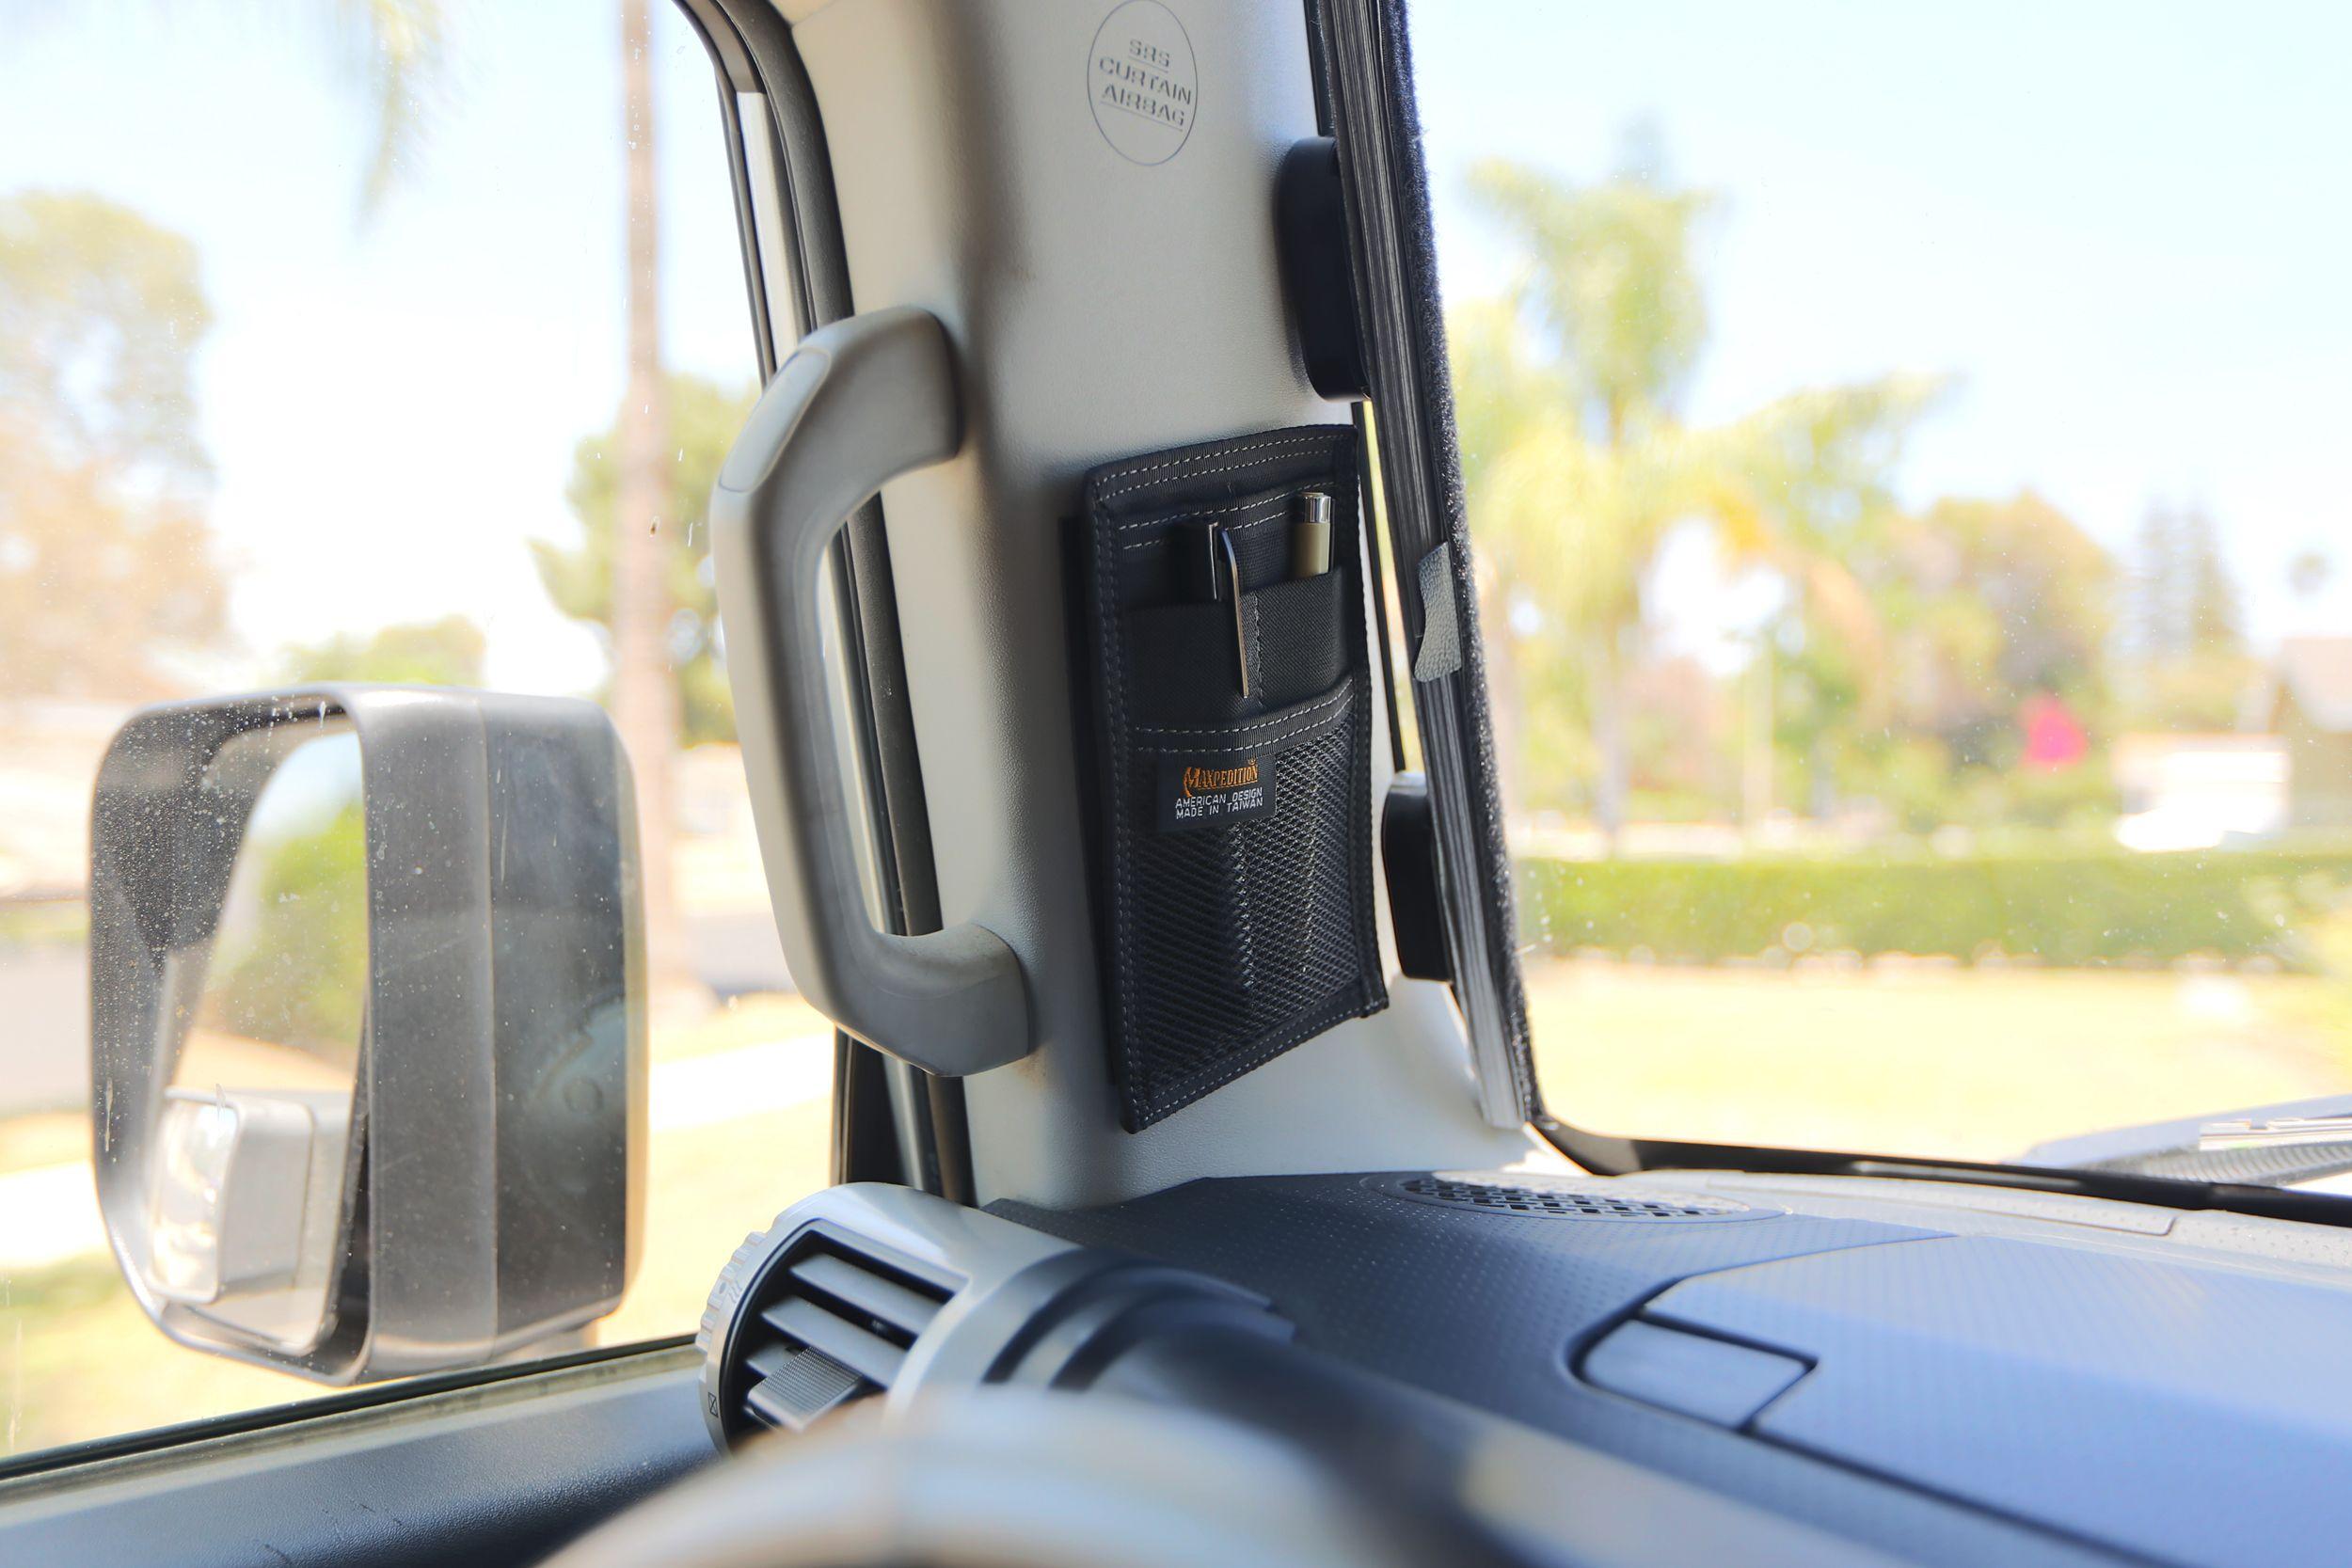 Fj Cruiser Maxpedition Black Compact Hook And Loop Mini Organizer Held By 4x6 Velcro Fj Cruiser Bug Out Vehicle Toyota Fj Cruiser